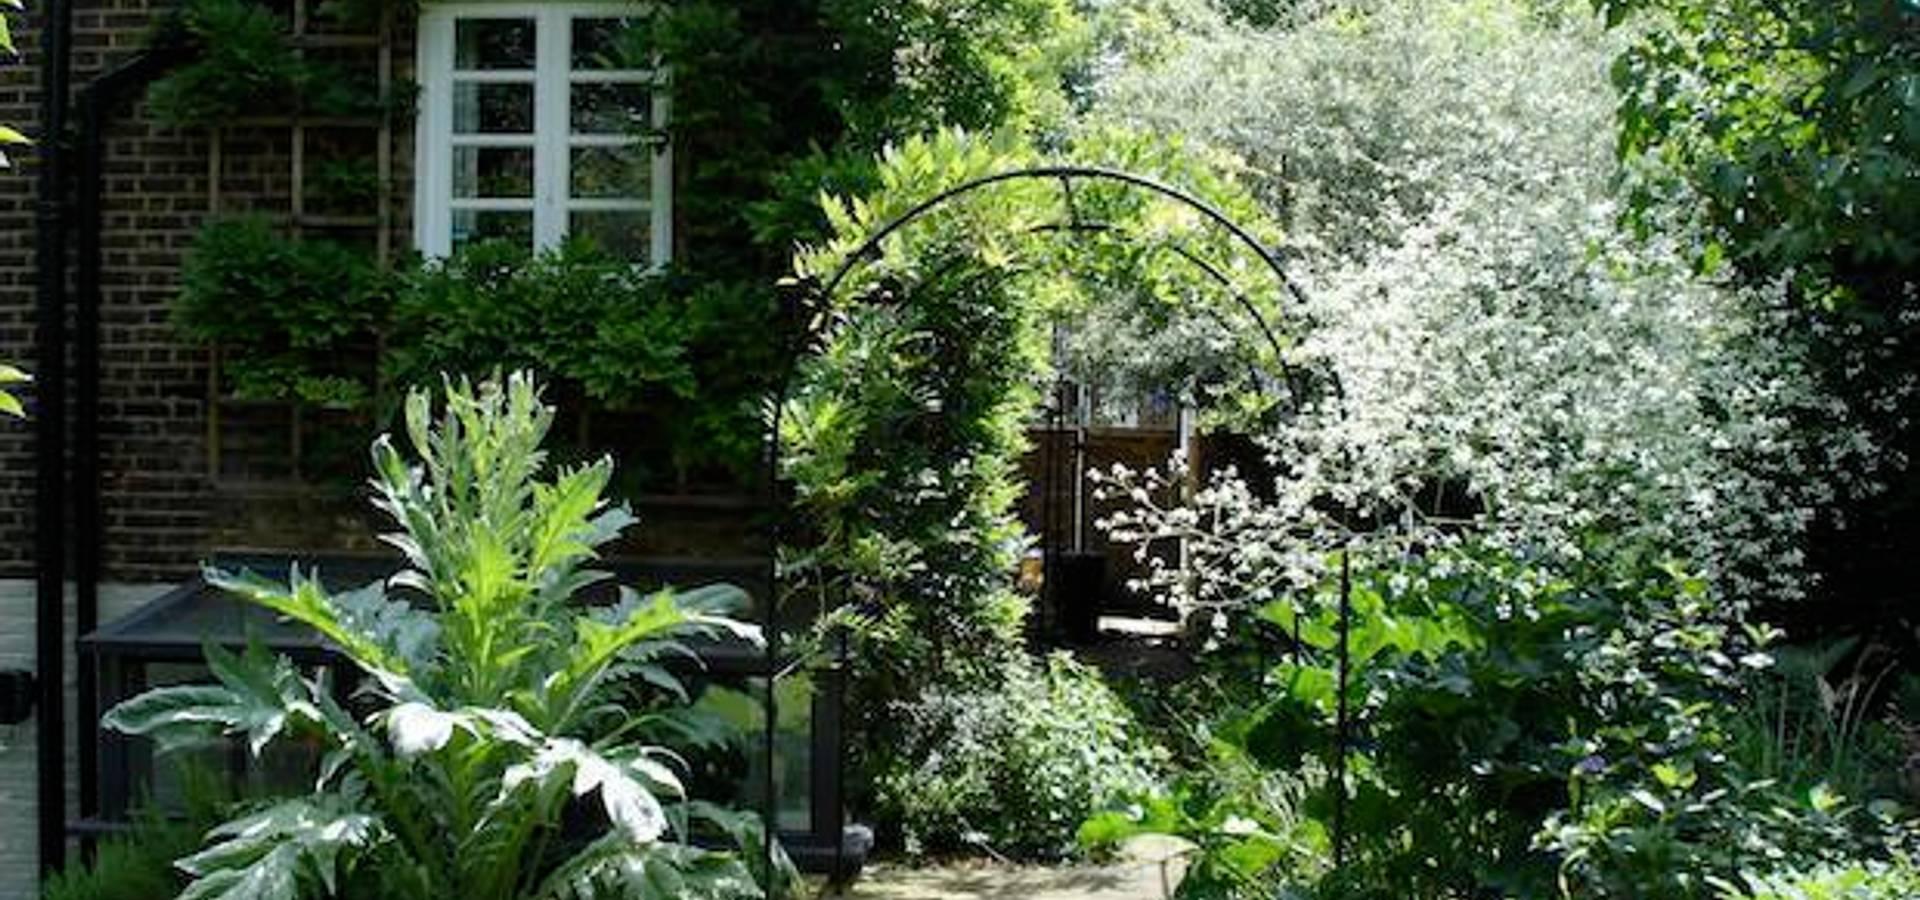 Carol whitehead garden design hoveniers tuinarchitecten for Garden design 1920 s